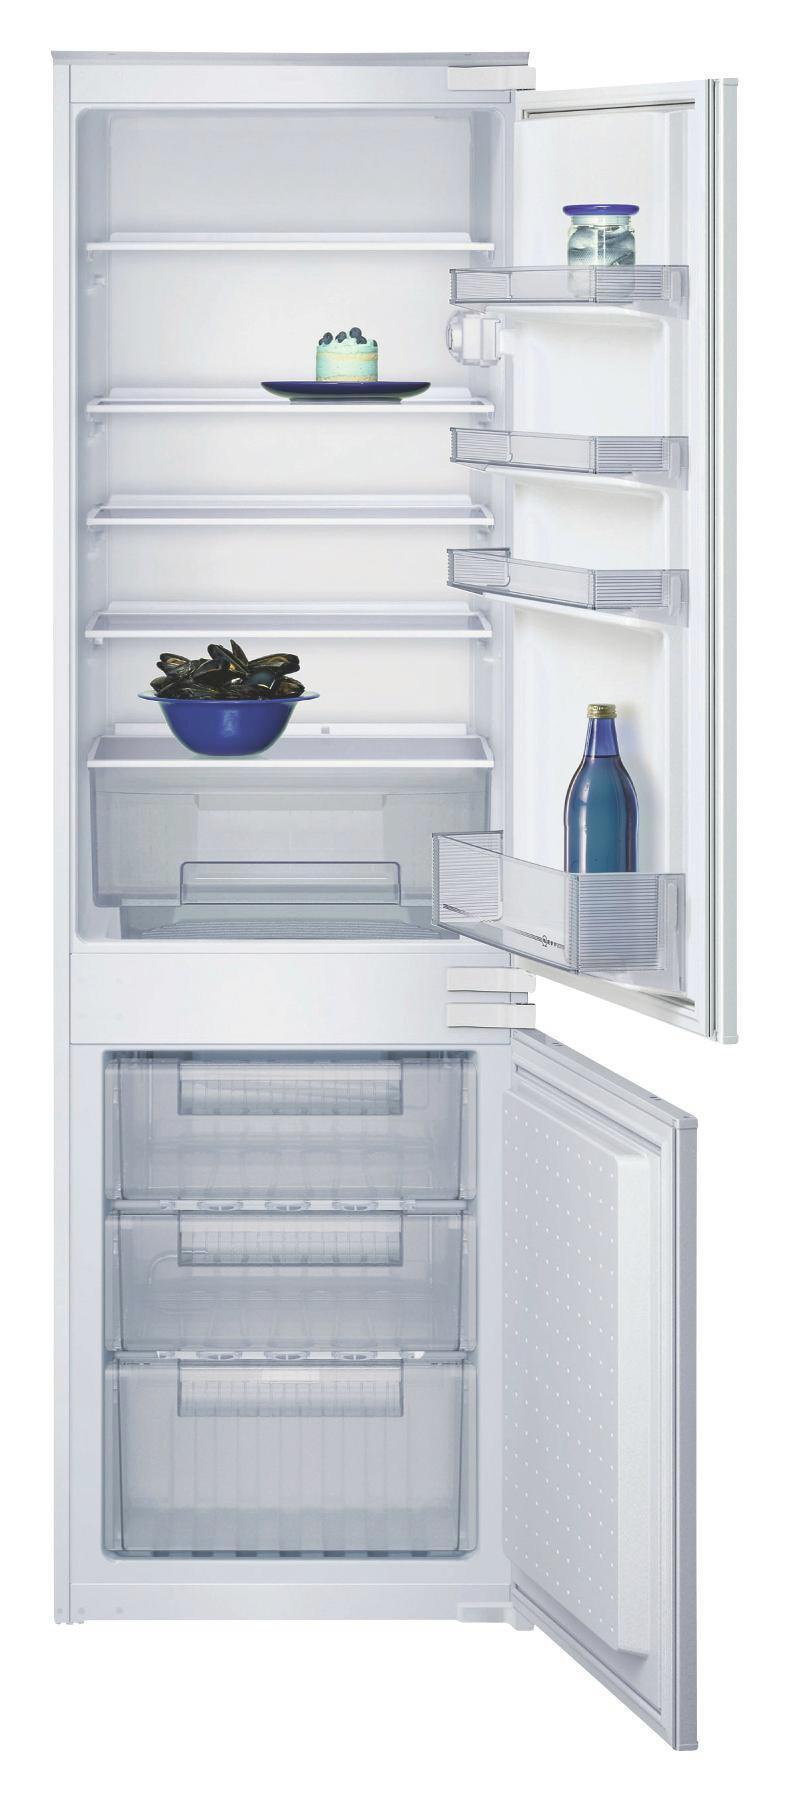 Kühl-Gefrier-Kombination Neff Kg714a1, EEZ A+ - Weiß, MODERN (54,1/177,2/54,5cm) - NEFF